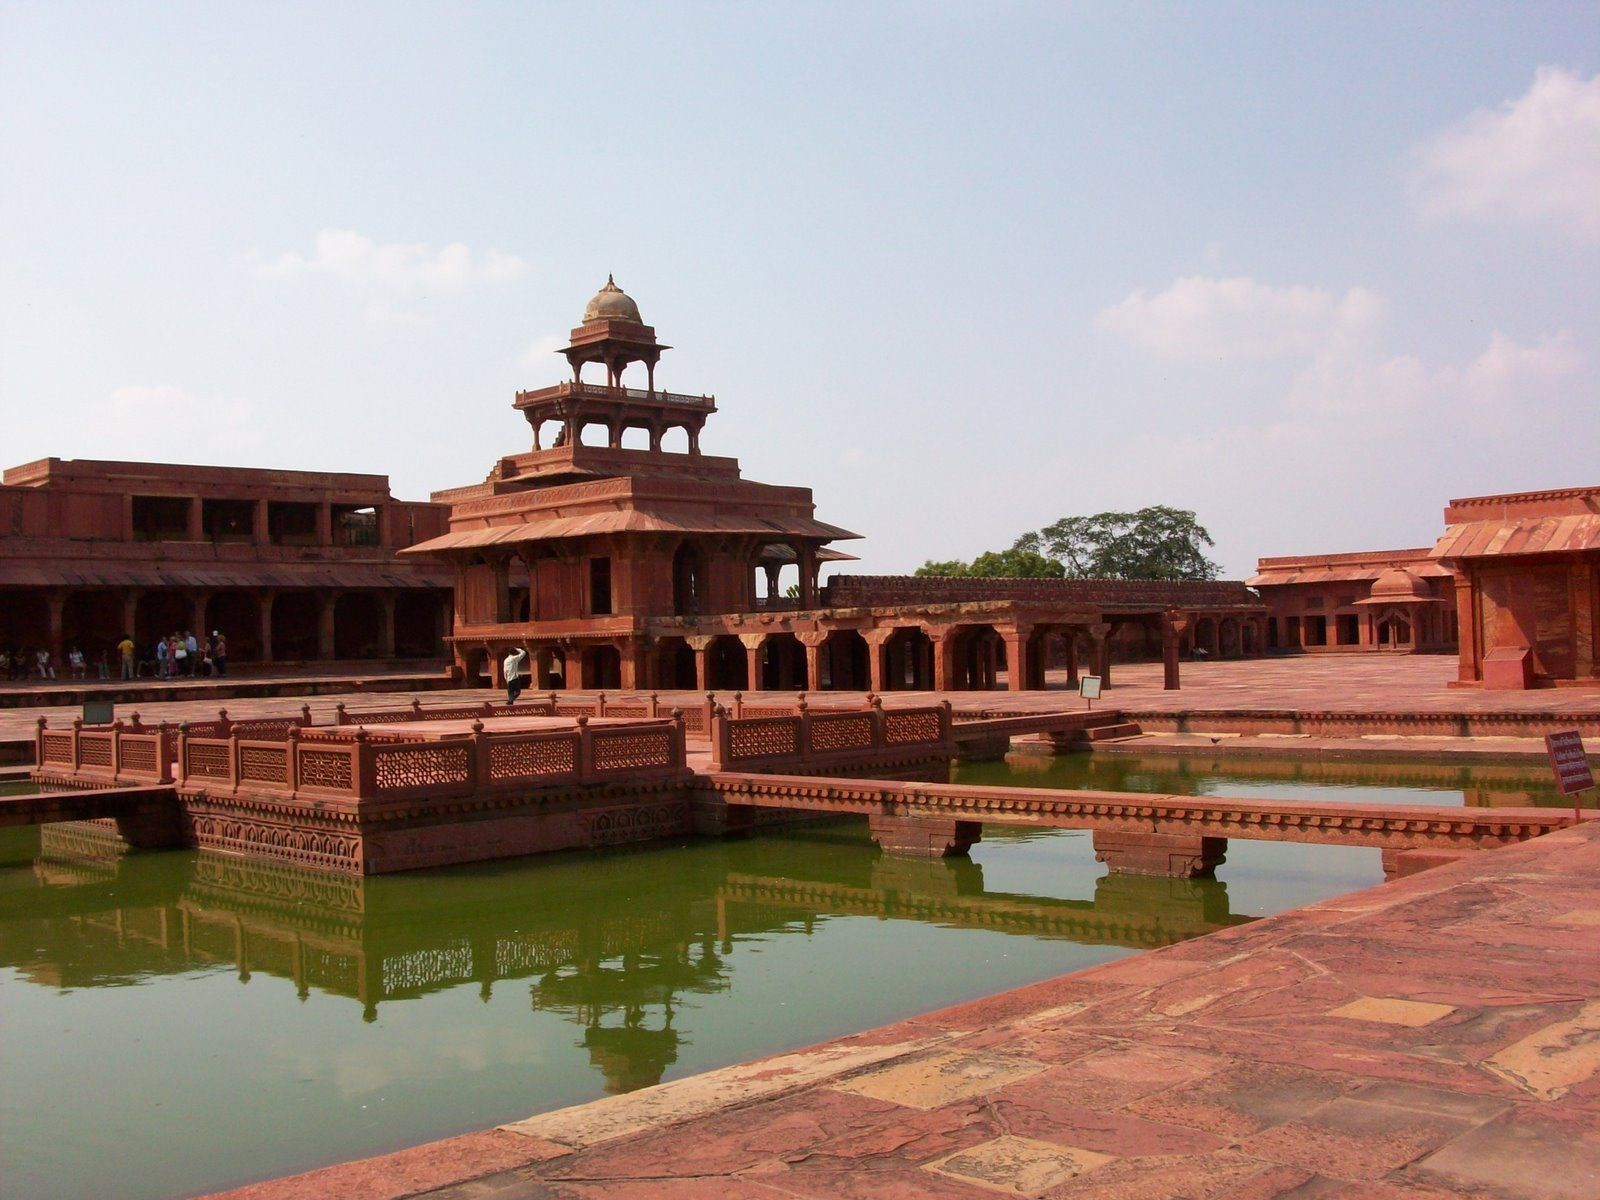 Resultado de imagen de Fatehpur Sikri palace architecture